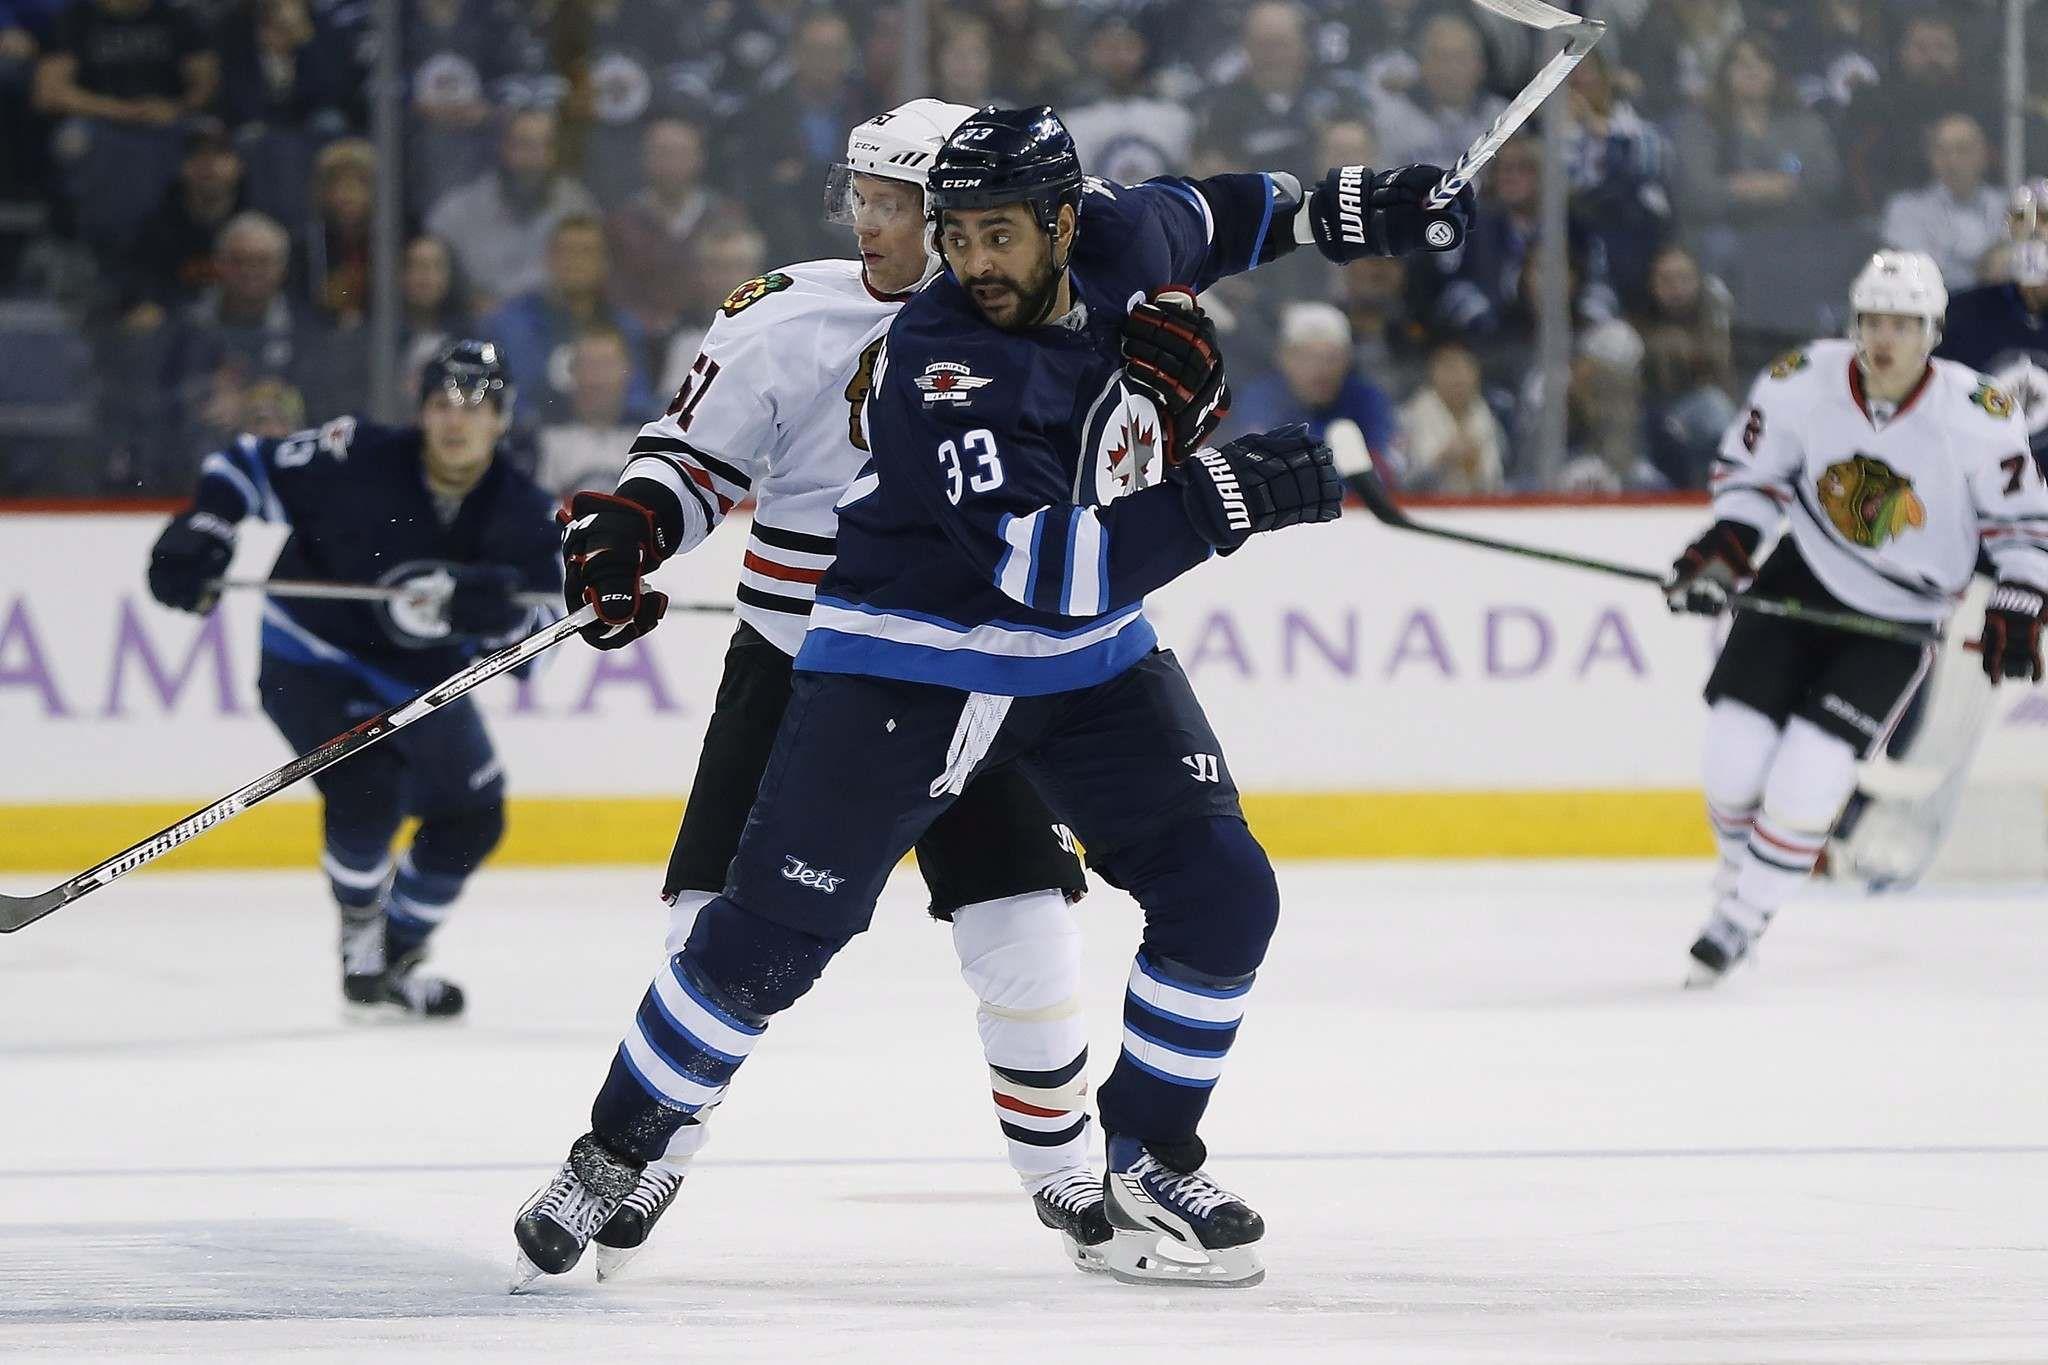 John Woods / The Canadian Press Winnipeg Jets' Dustin